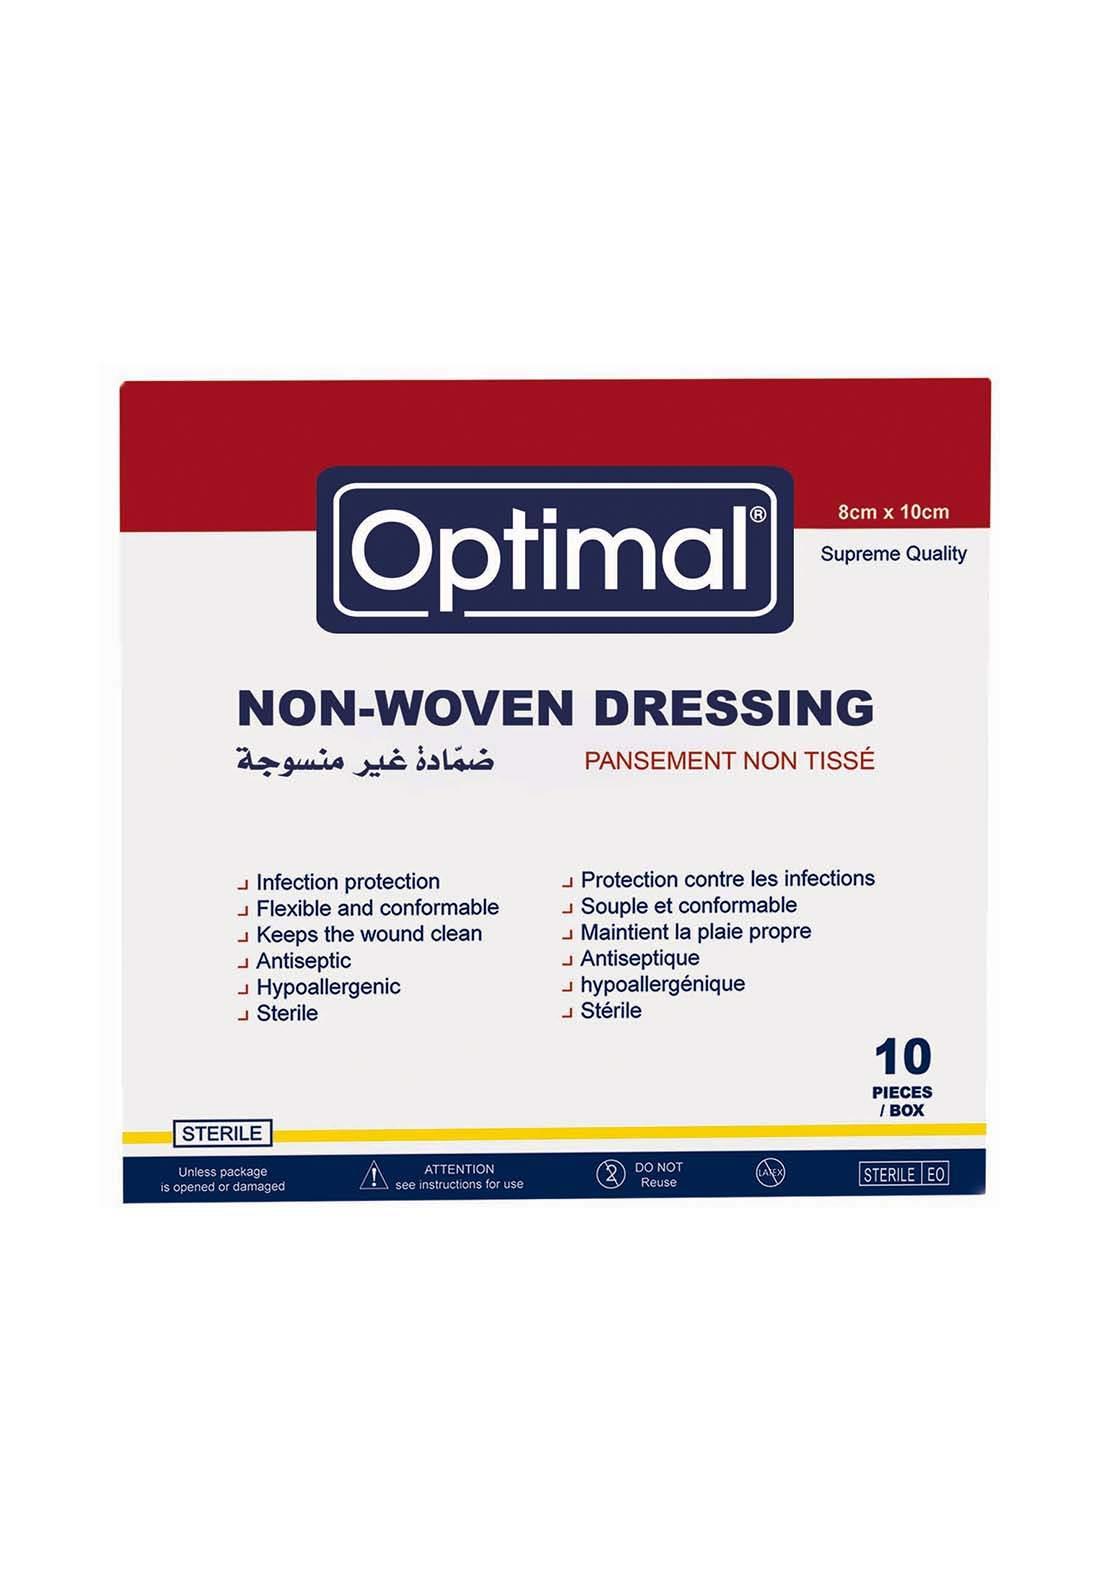 Optimal Non woven dressing 8*10cm ضمادات جروح طبية غير نسيجية